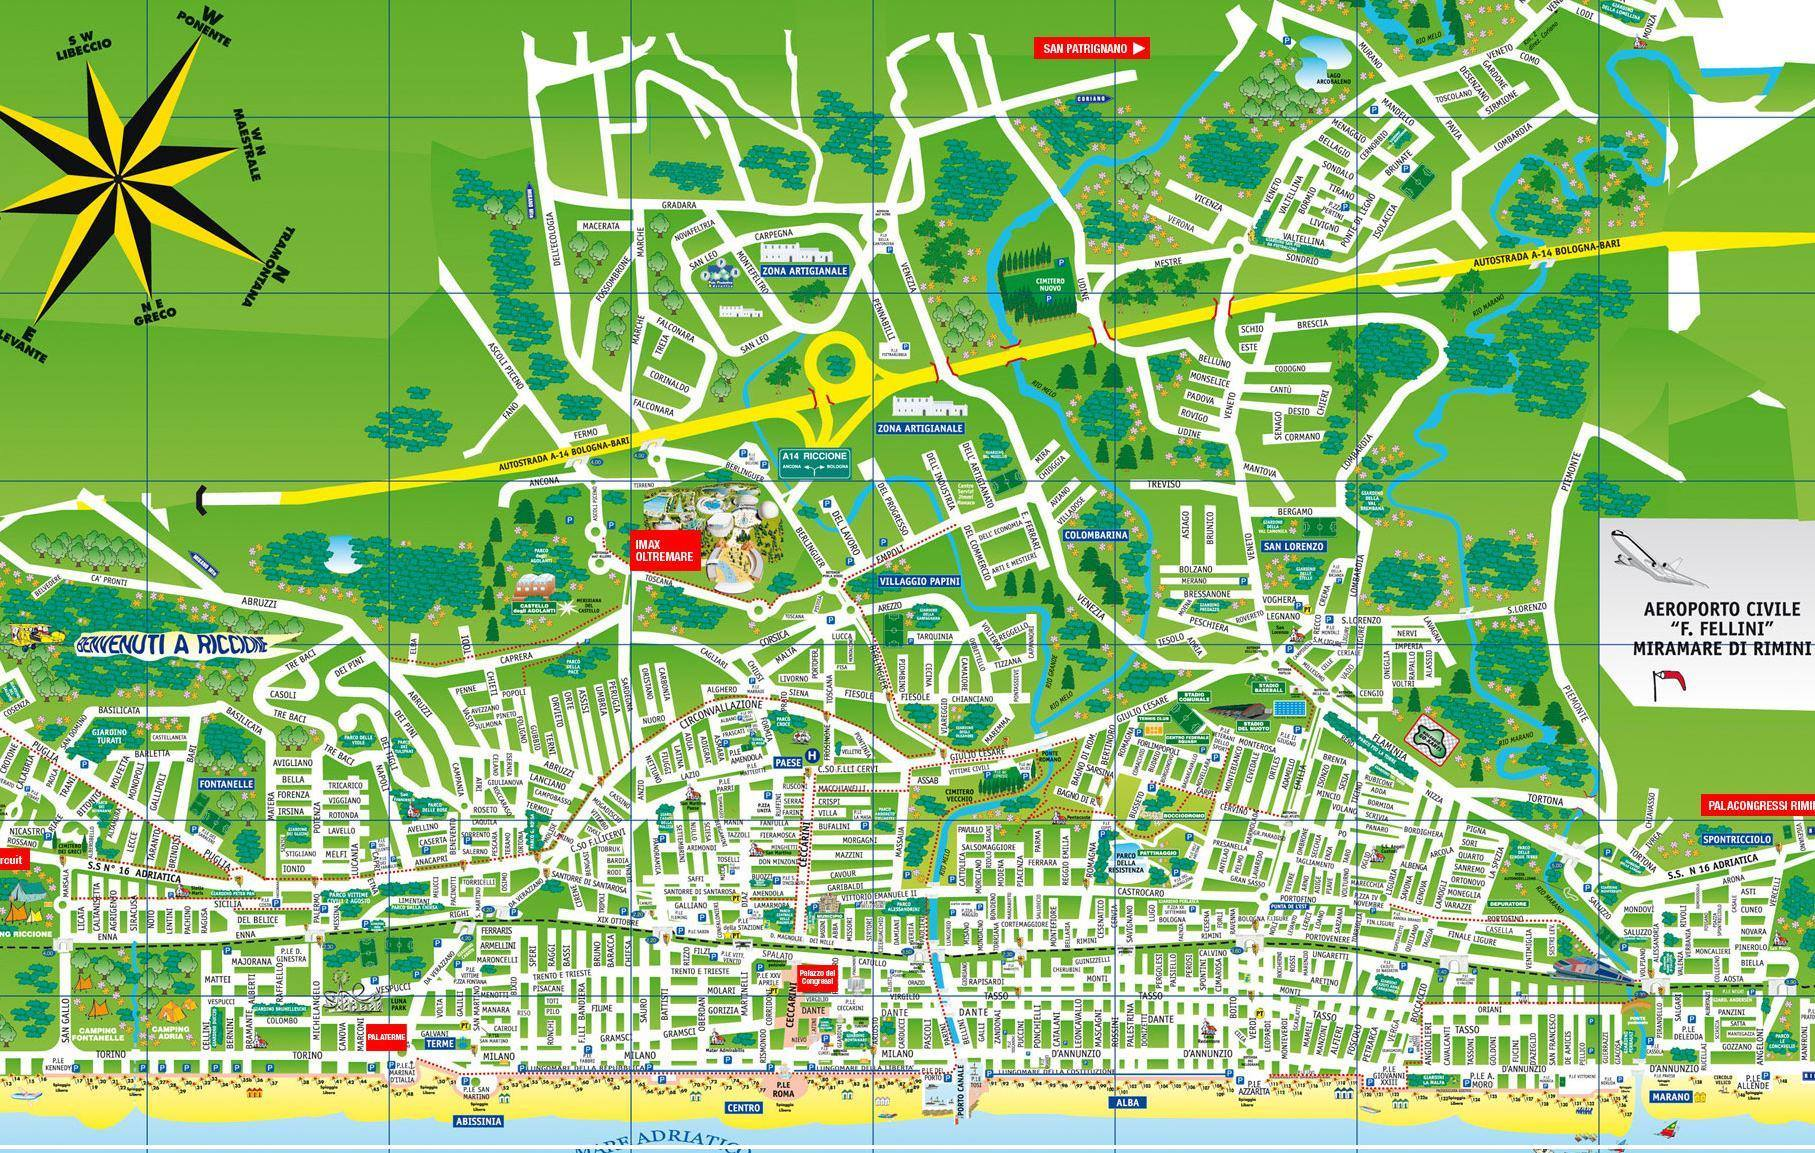 cariati map pa stradale rimini - photo#21